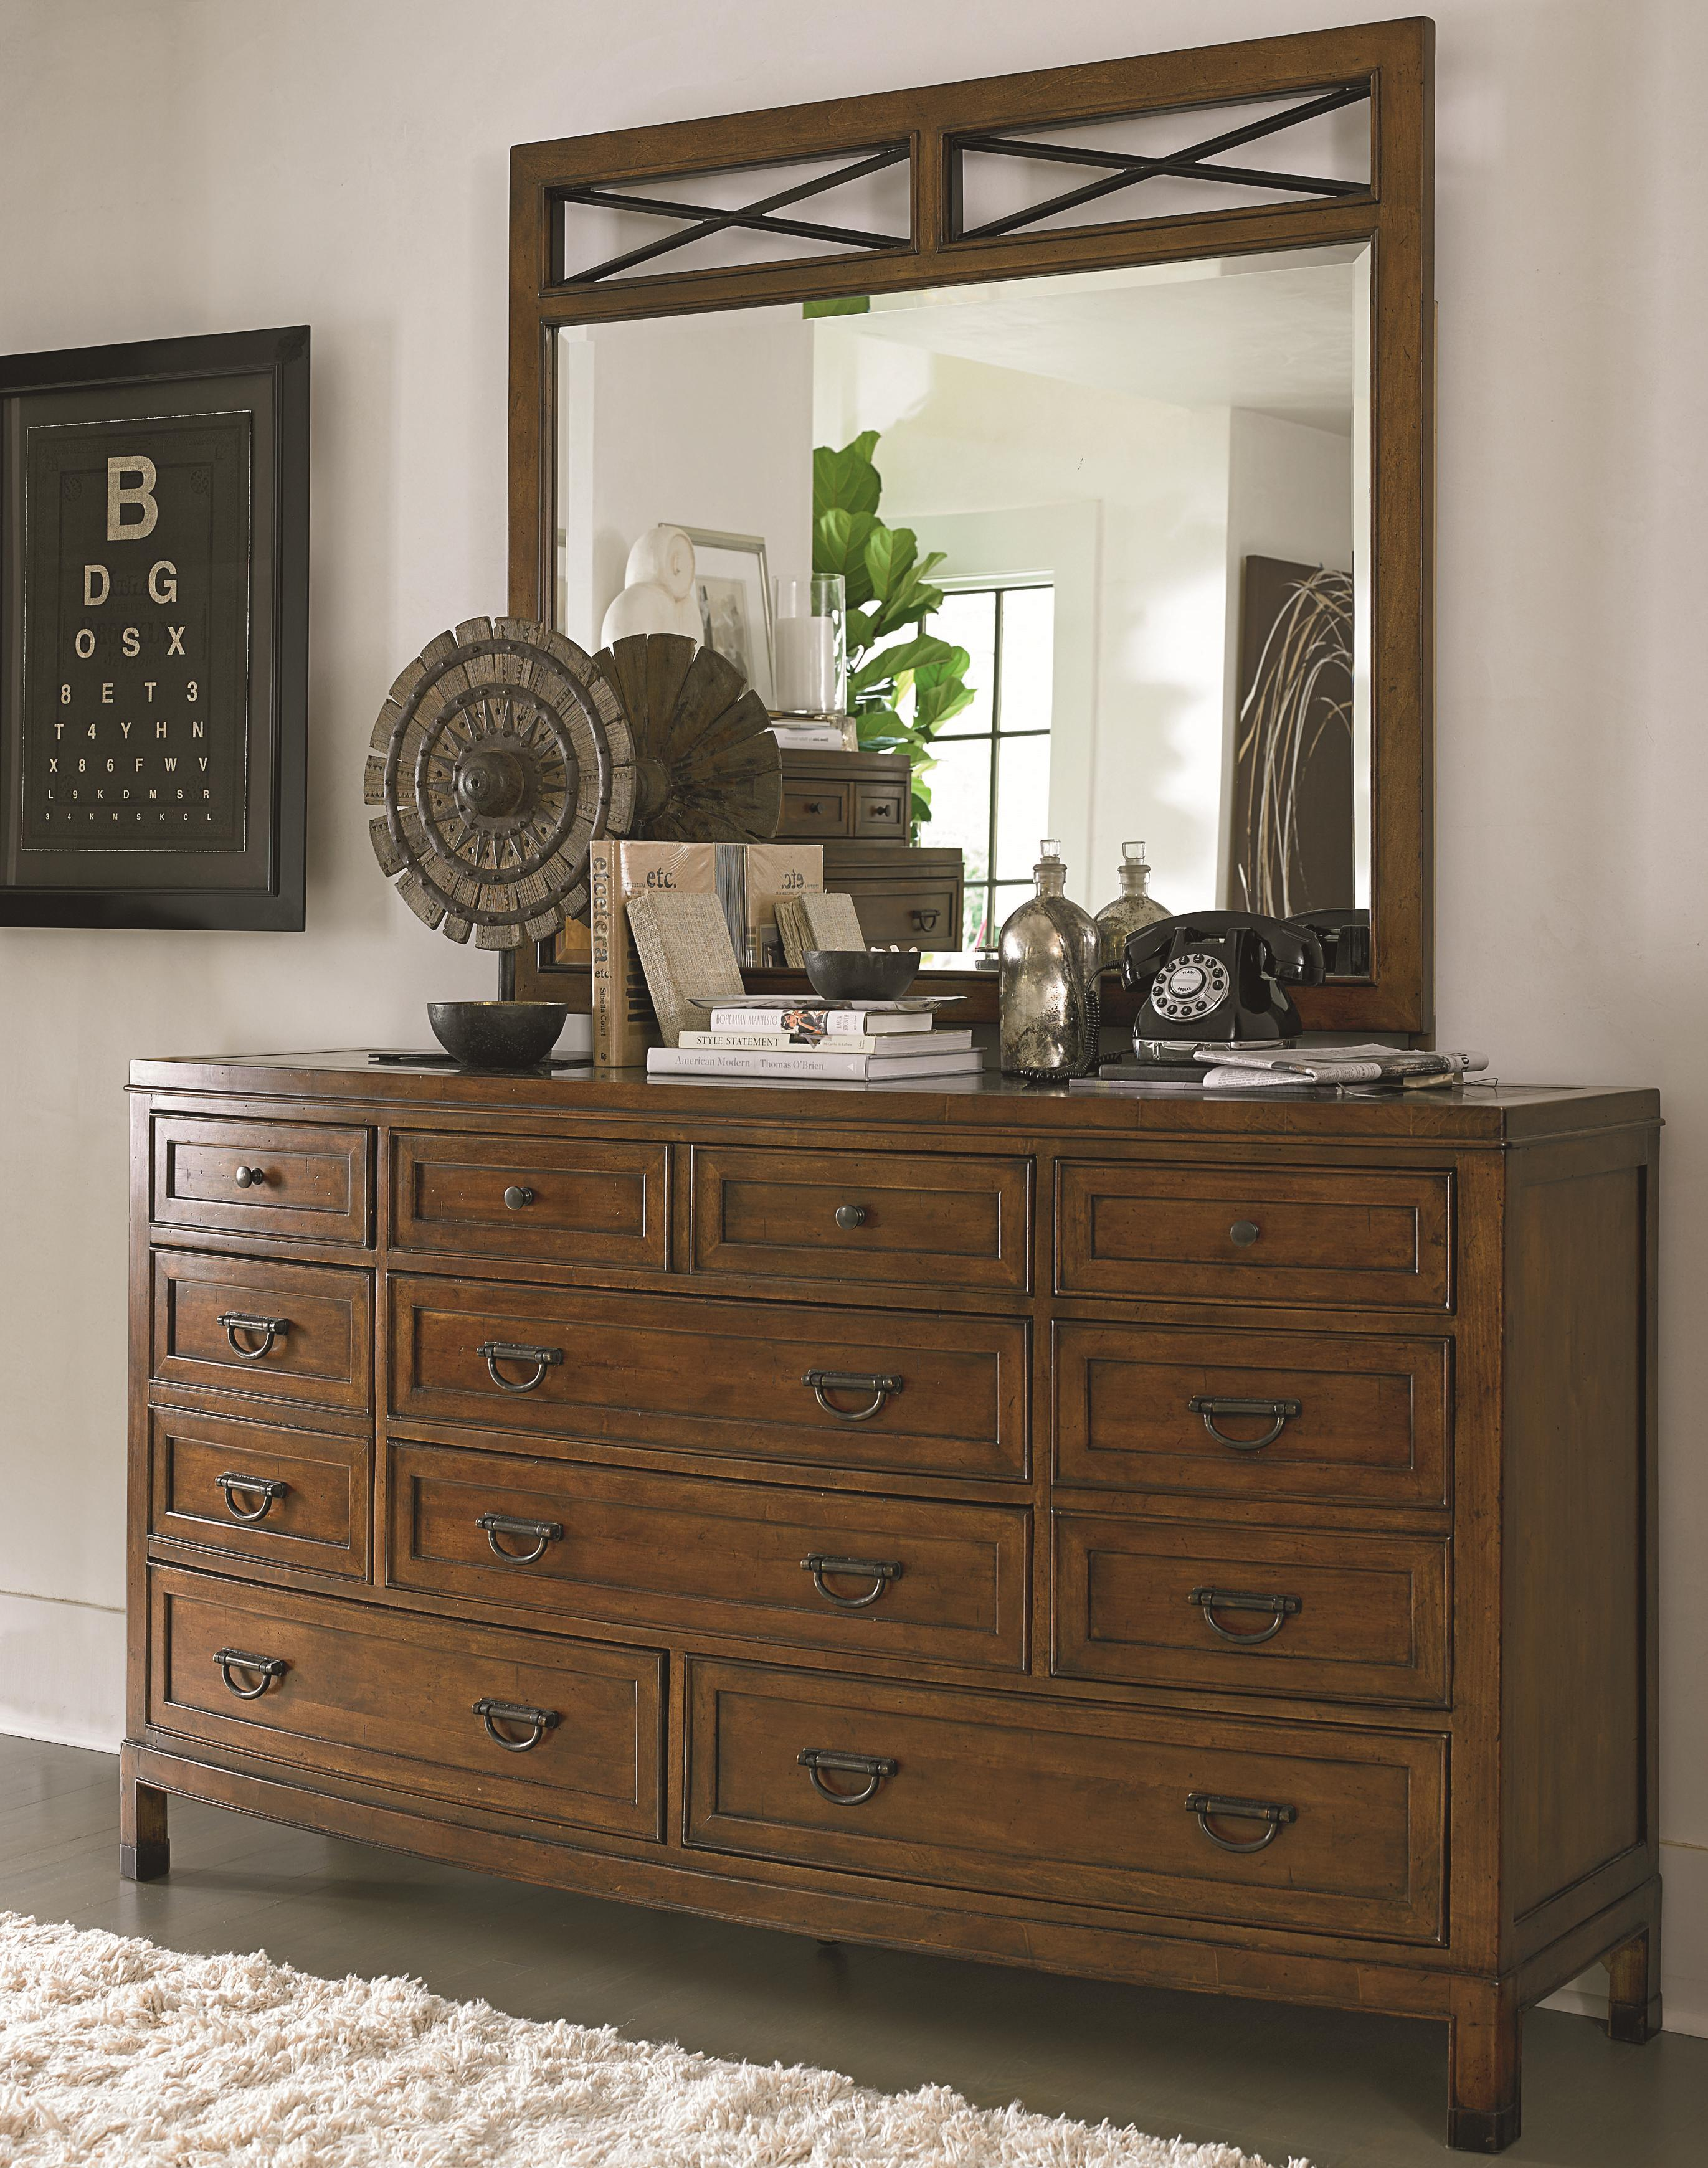 Thomasville® American Anthem Dresser and Mirror - Item Number: 82811-130+240